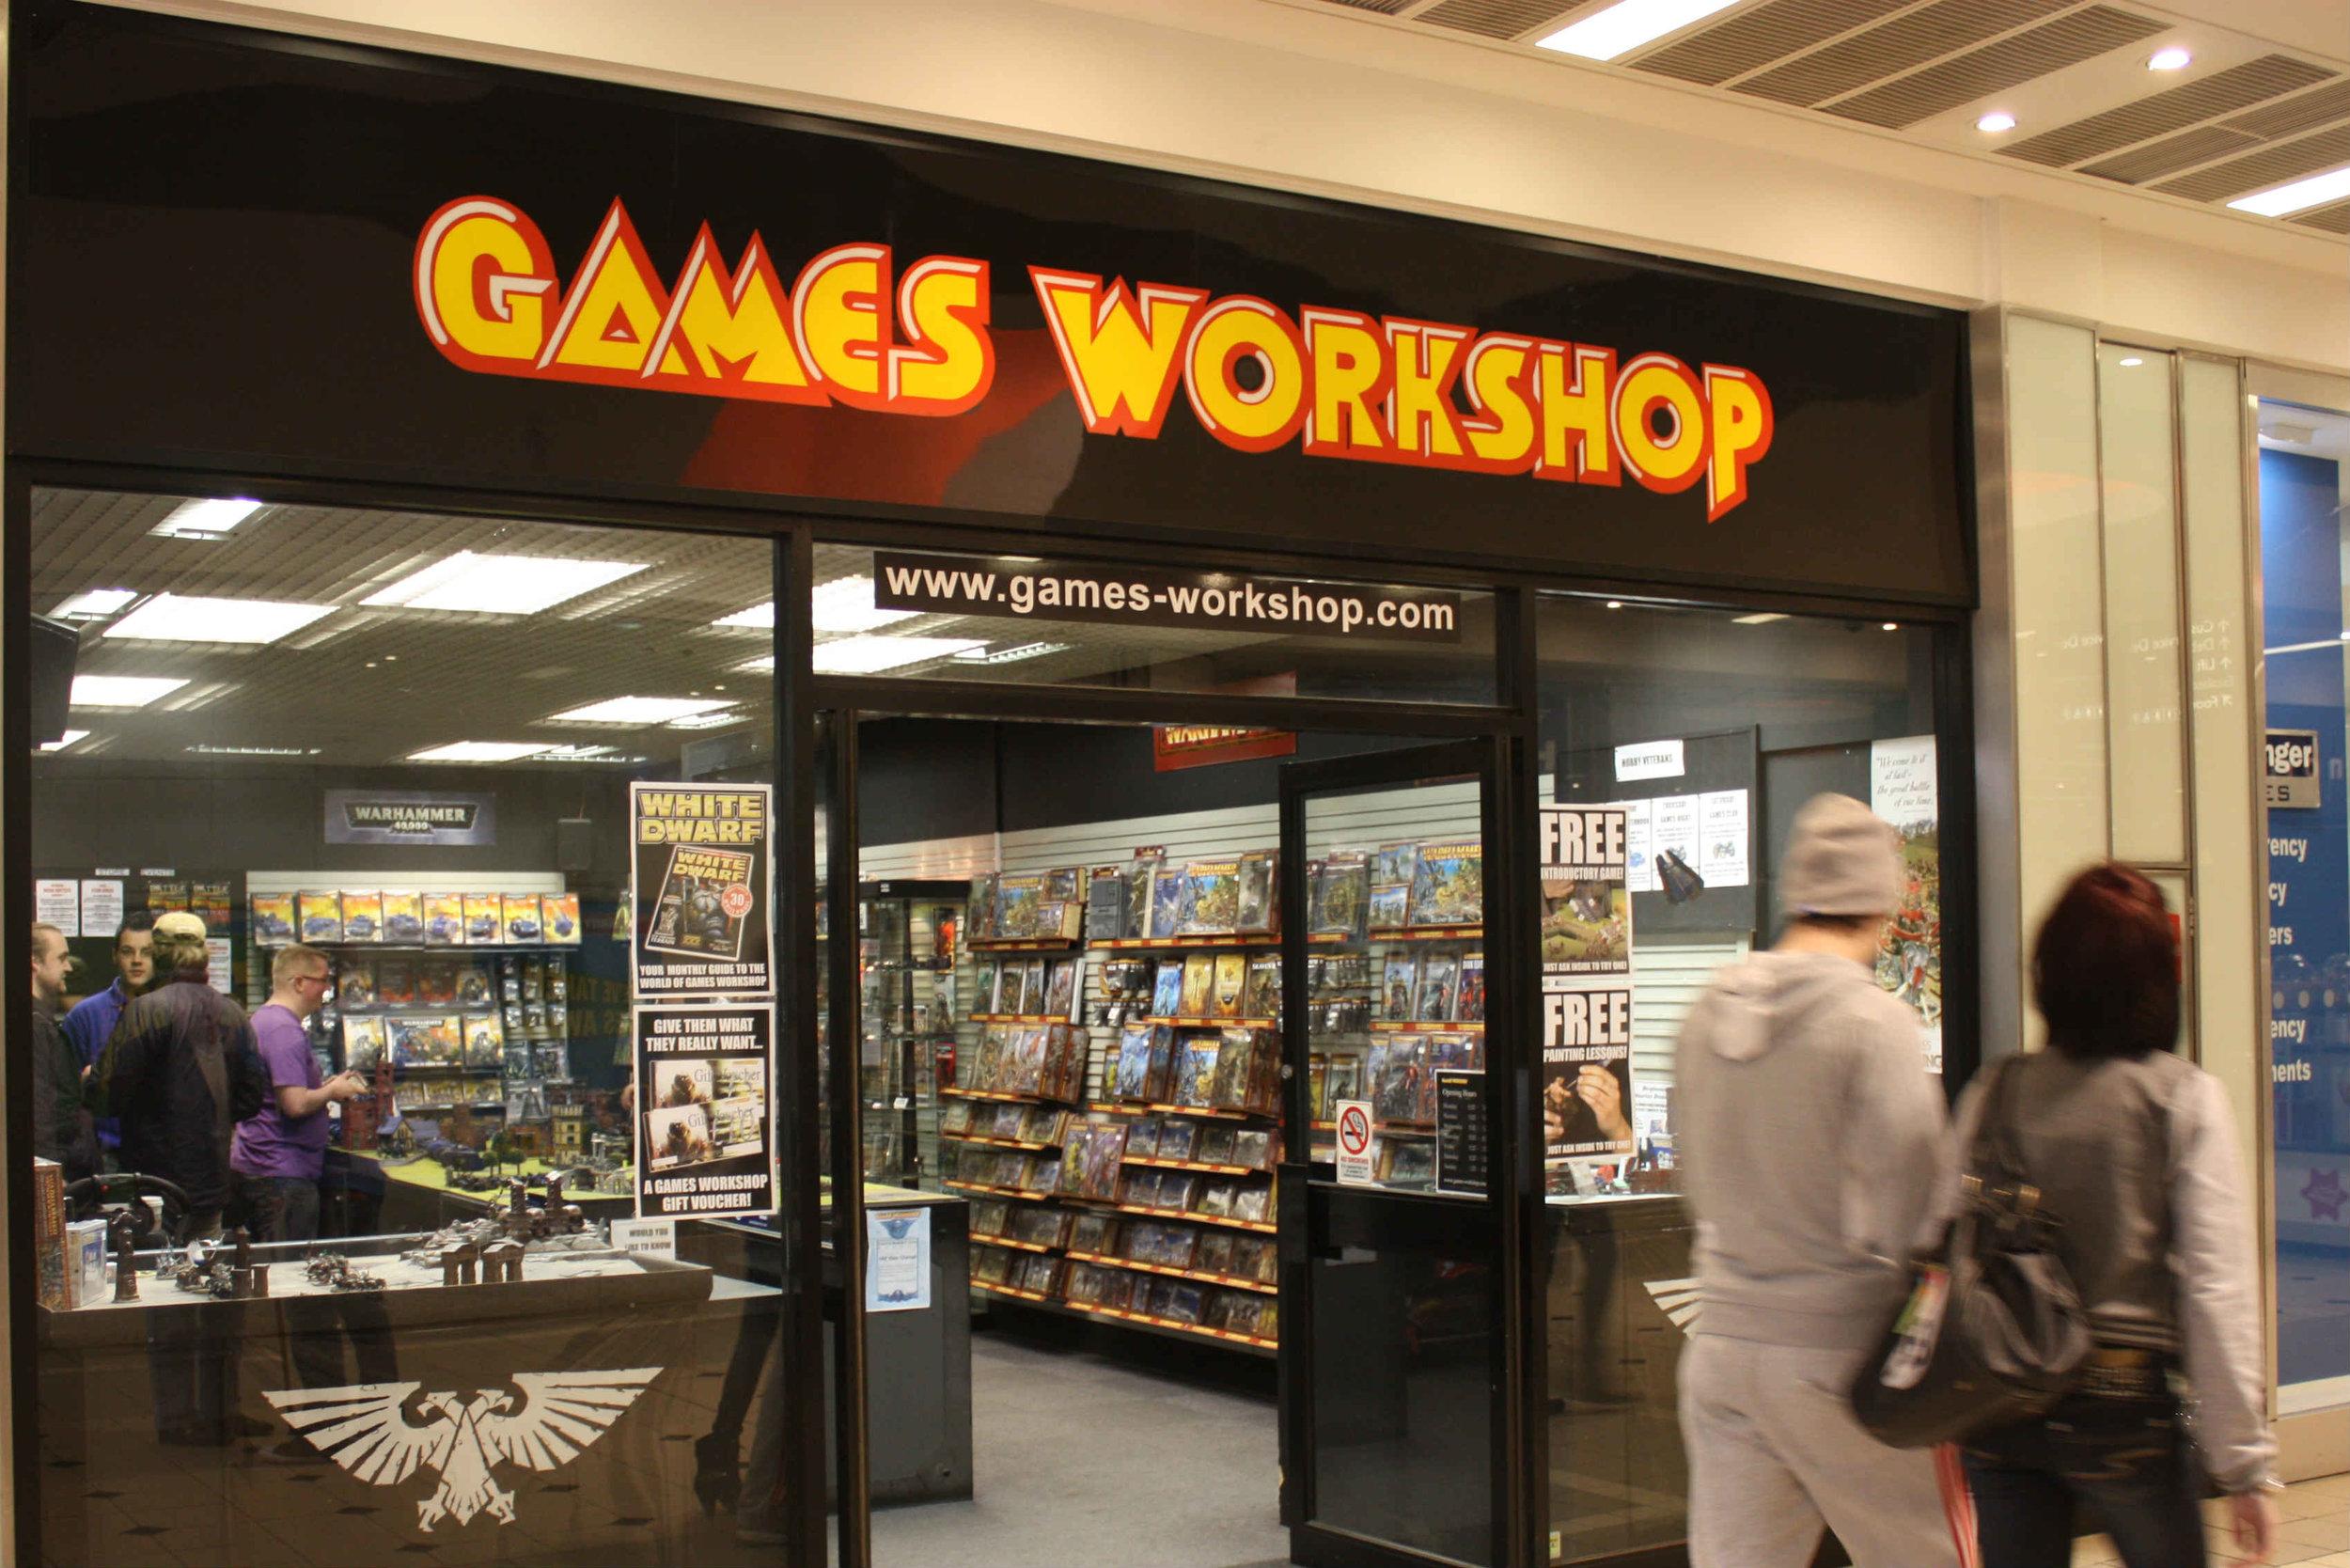 Games-Workshop_entertainment_shopfront_Wikimedia-Commons-6.jpg